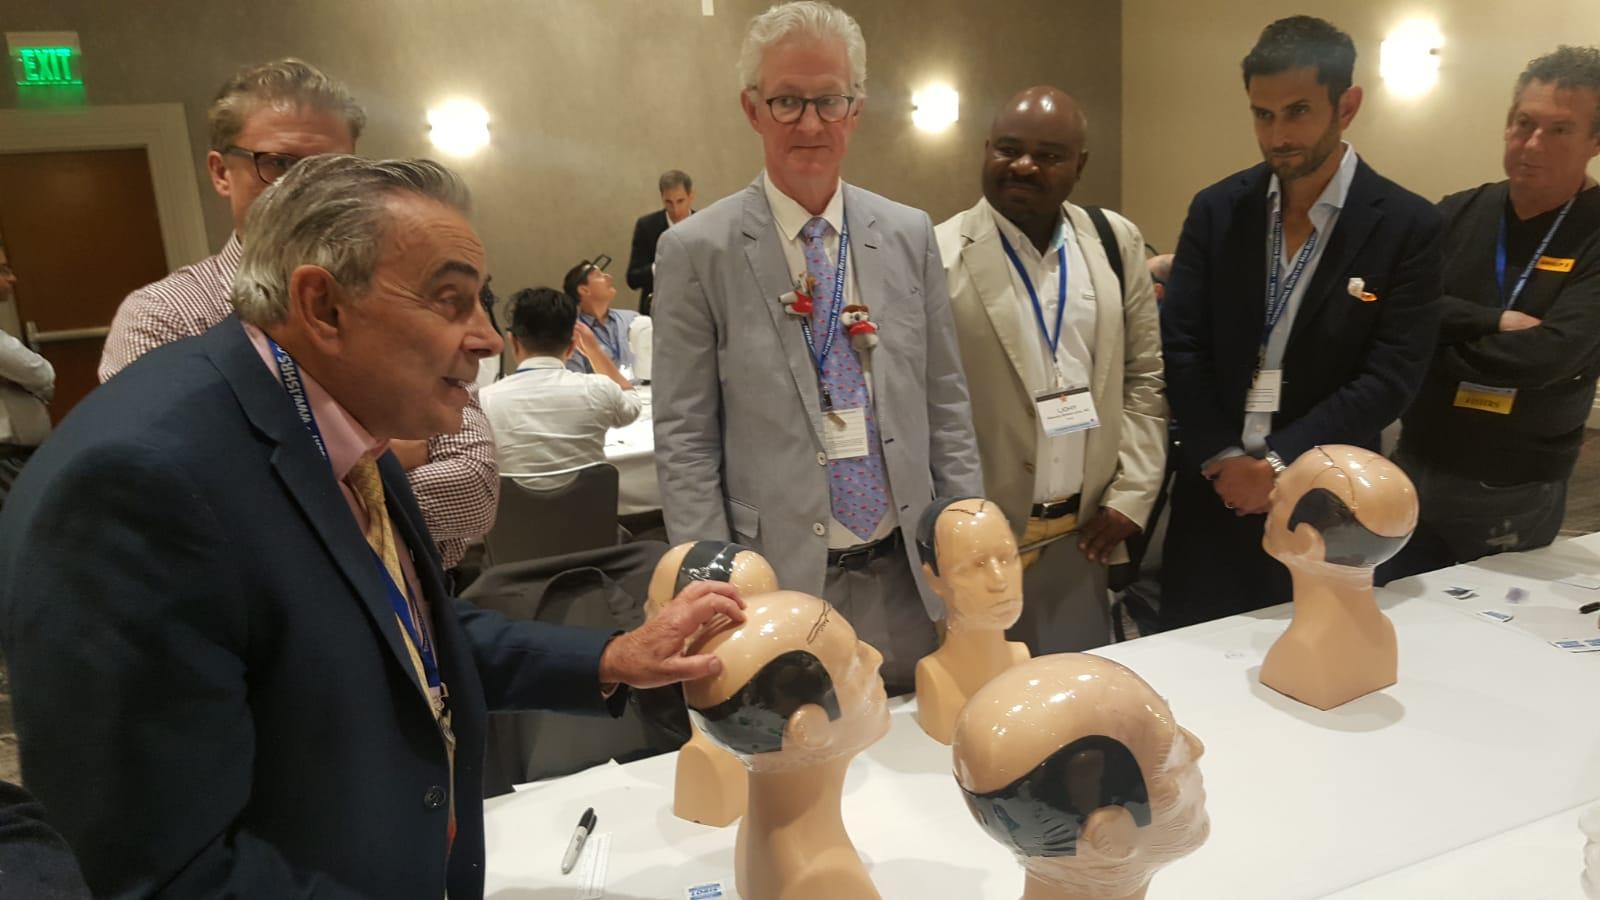 XXVI congreso mundial de trasplante capilar